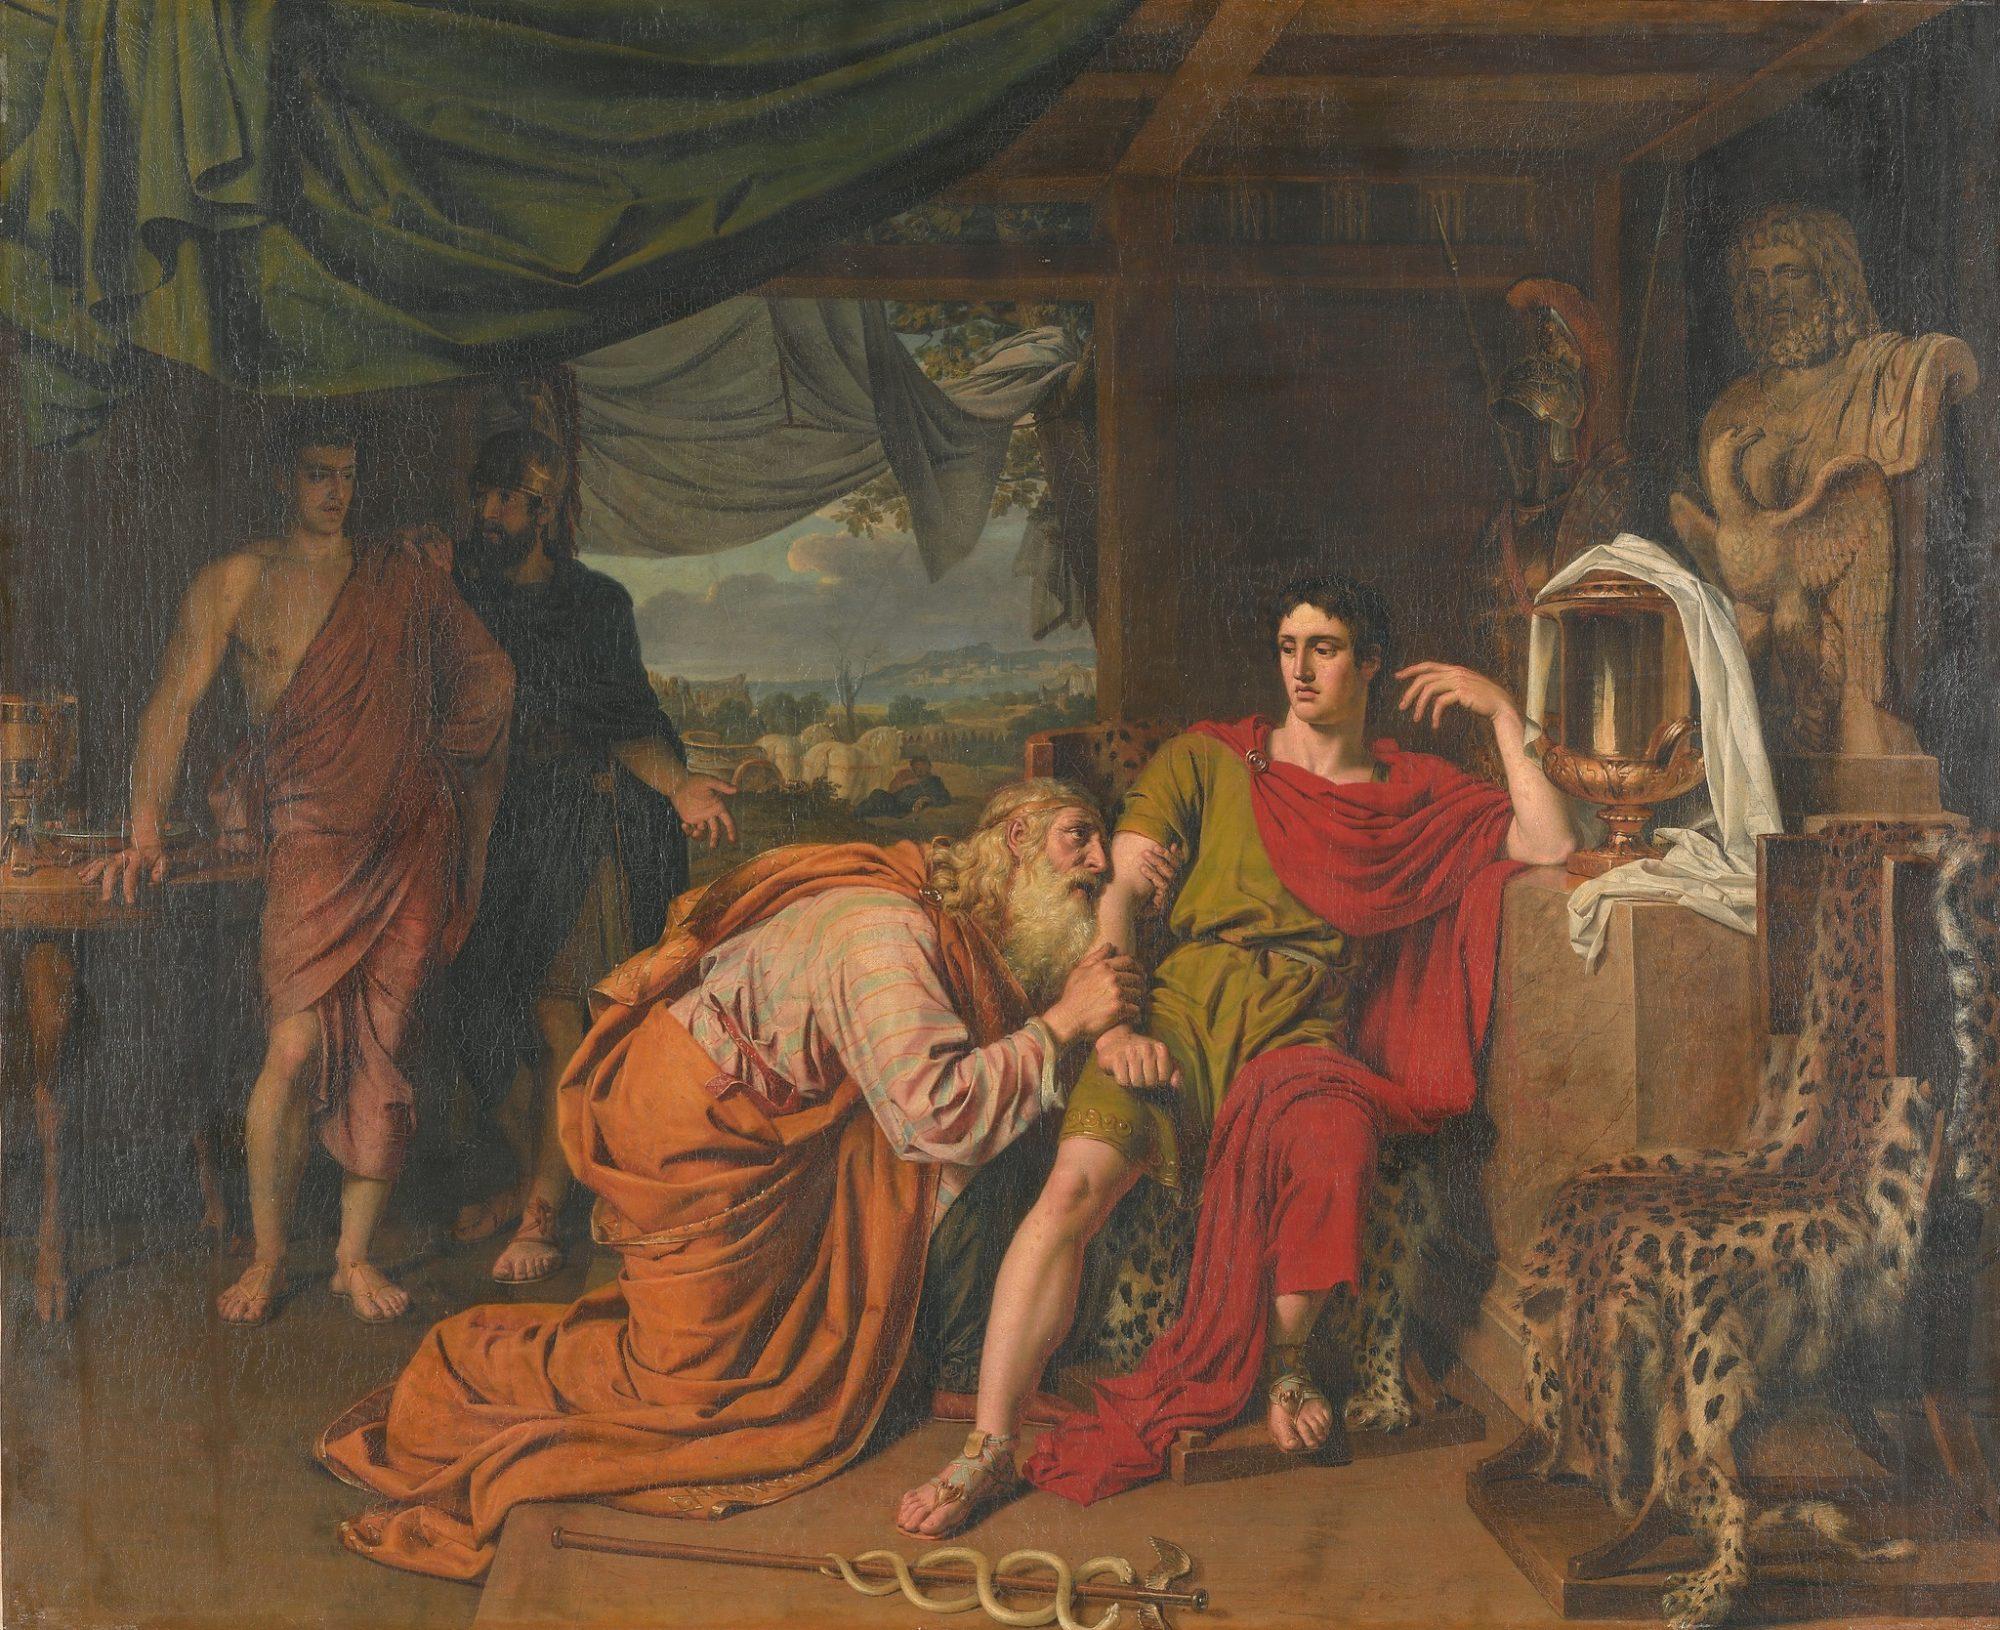 Александр Иванов, 1824 год, картина «Приам, испрашивающий у Ахиллеса тело Гектора».